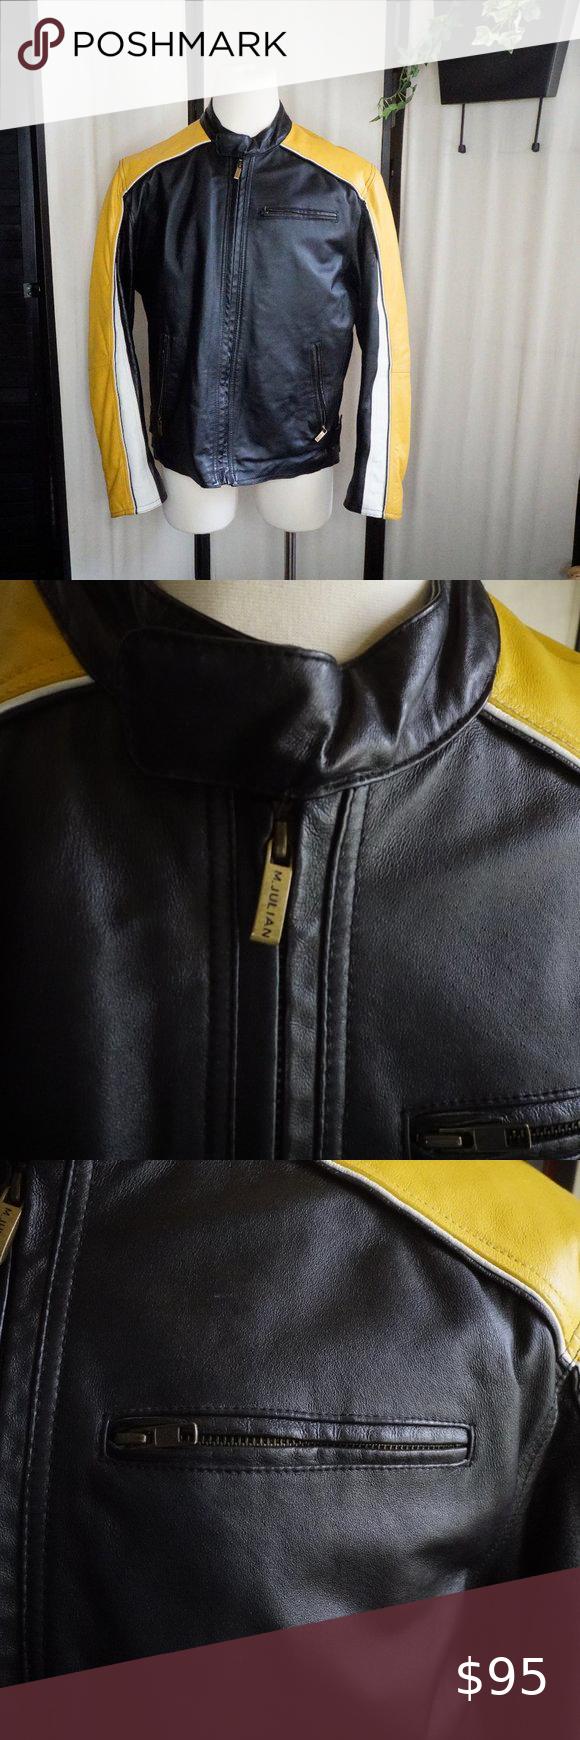 M Julian Yellow Black Leather Moto Jacket Wilson Black Leather Moto Jacket Leather Moto Jacket Black Leather [ 1740 x 580 Pixel ]